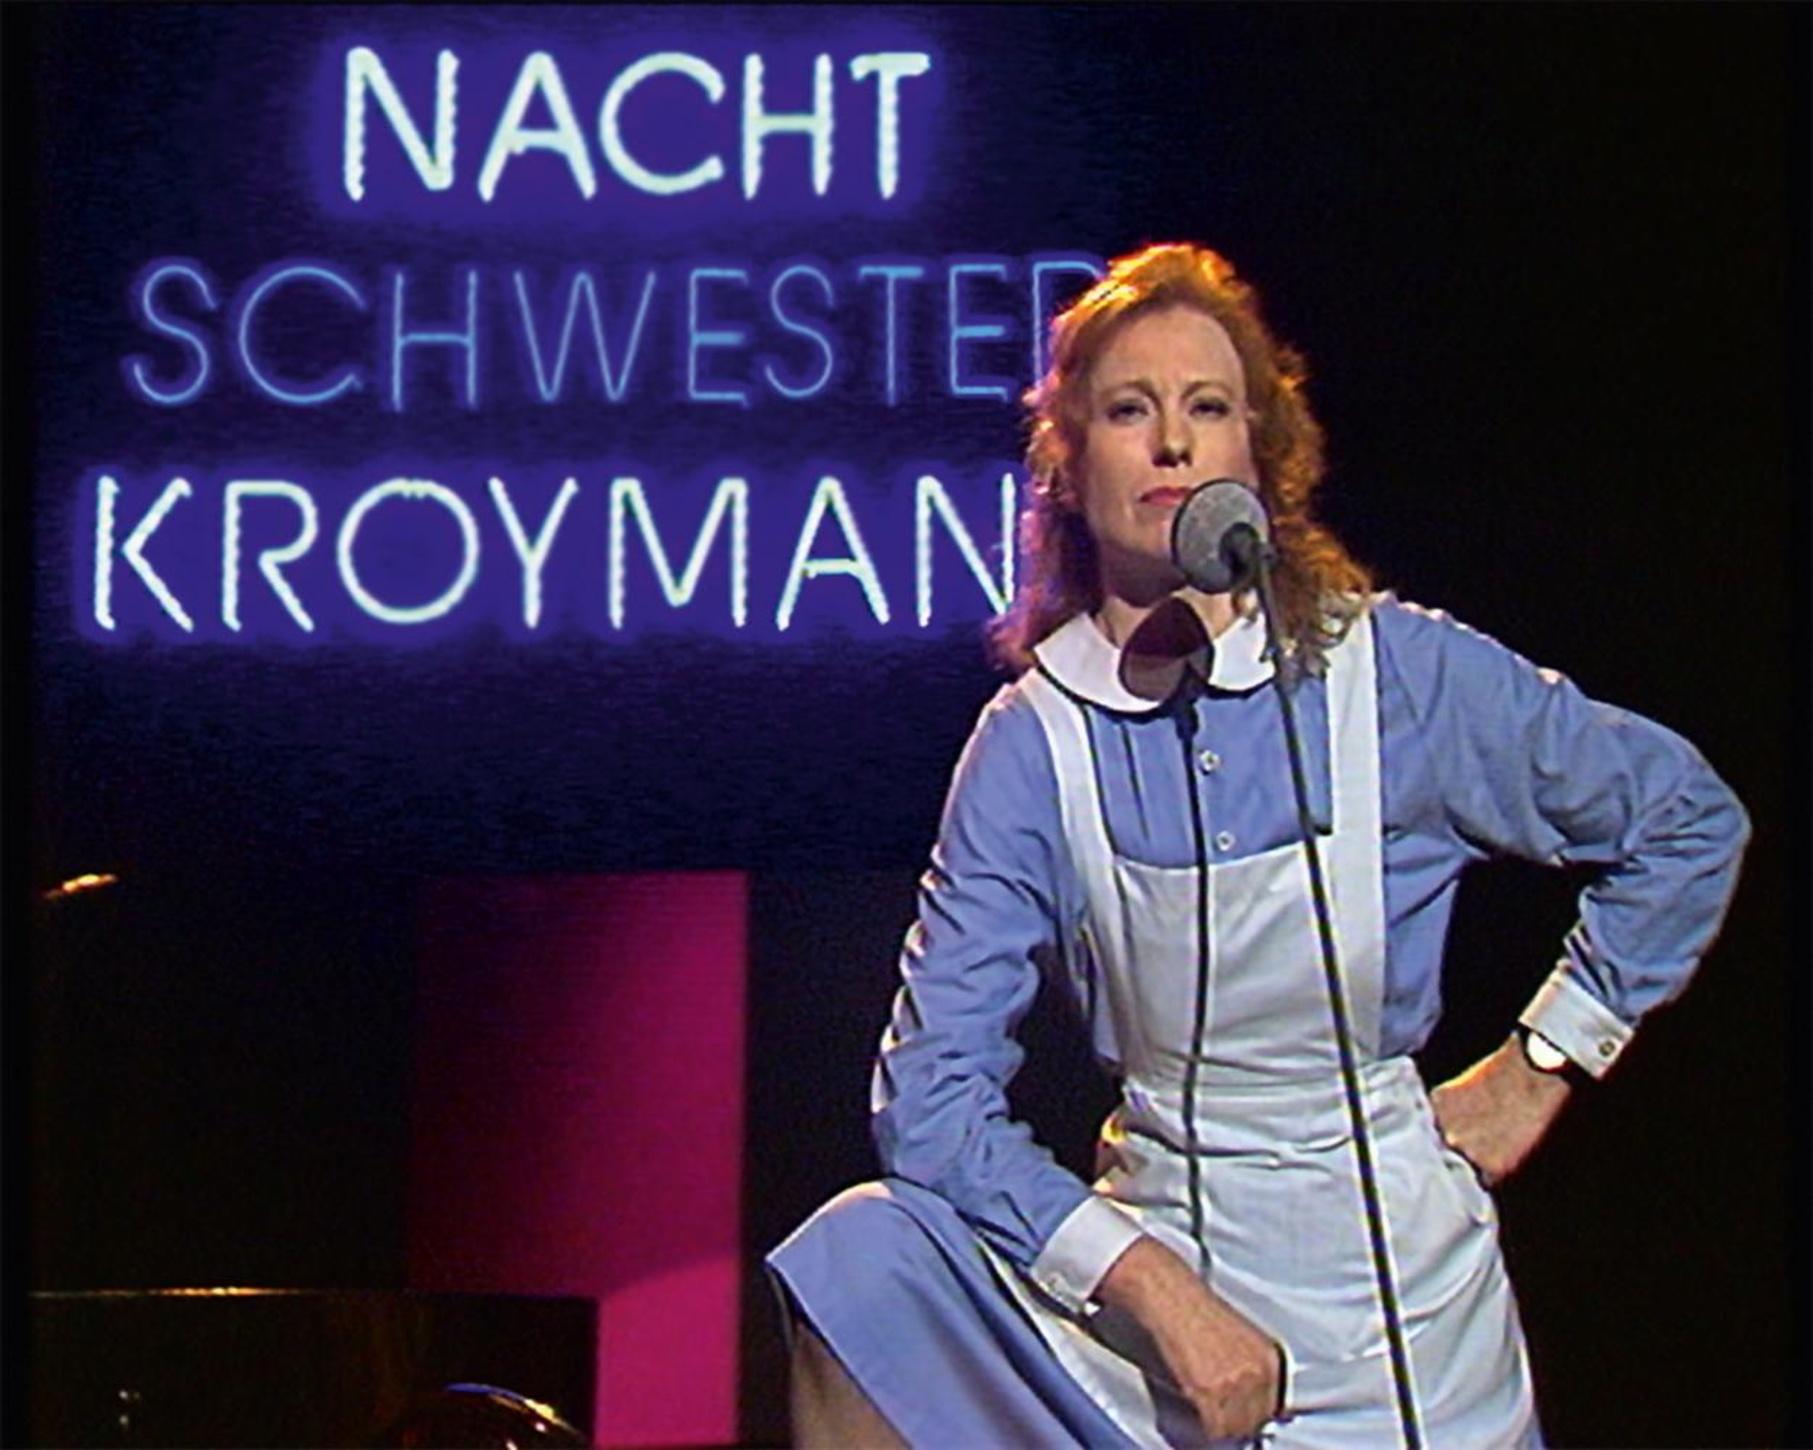 Kroymann Afd